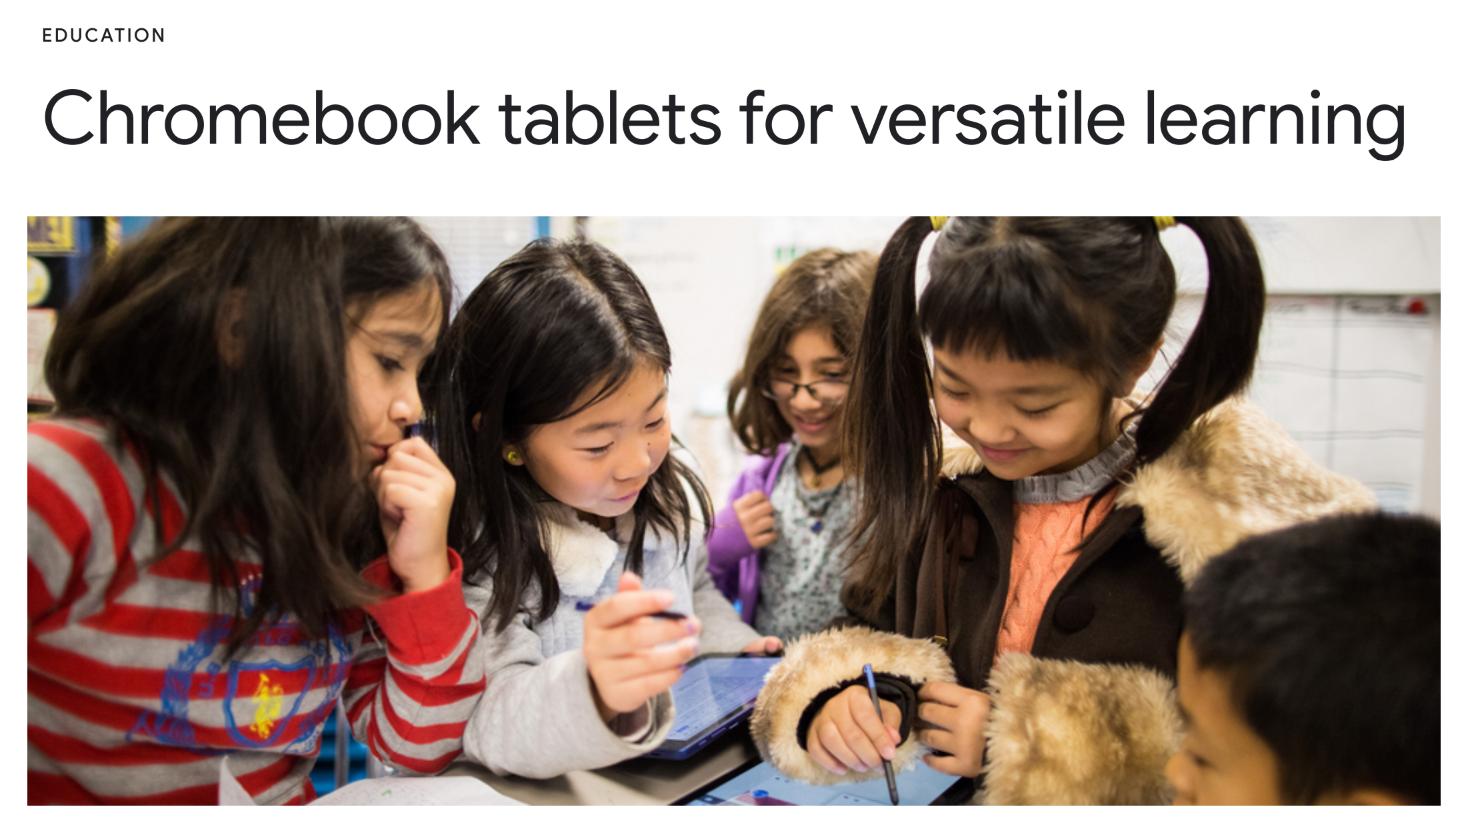 Chromebook tablets for versatile learning